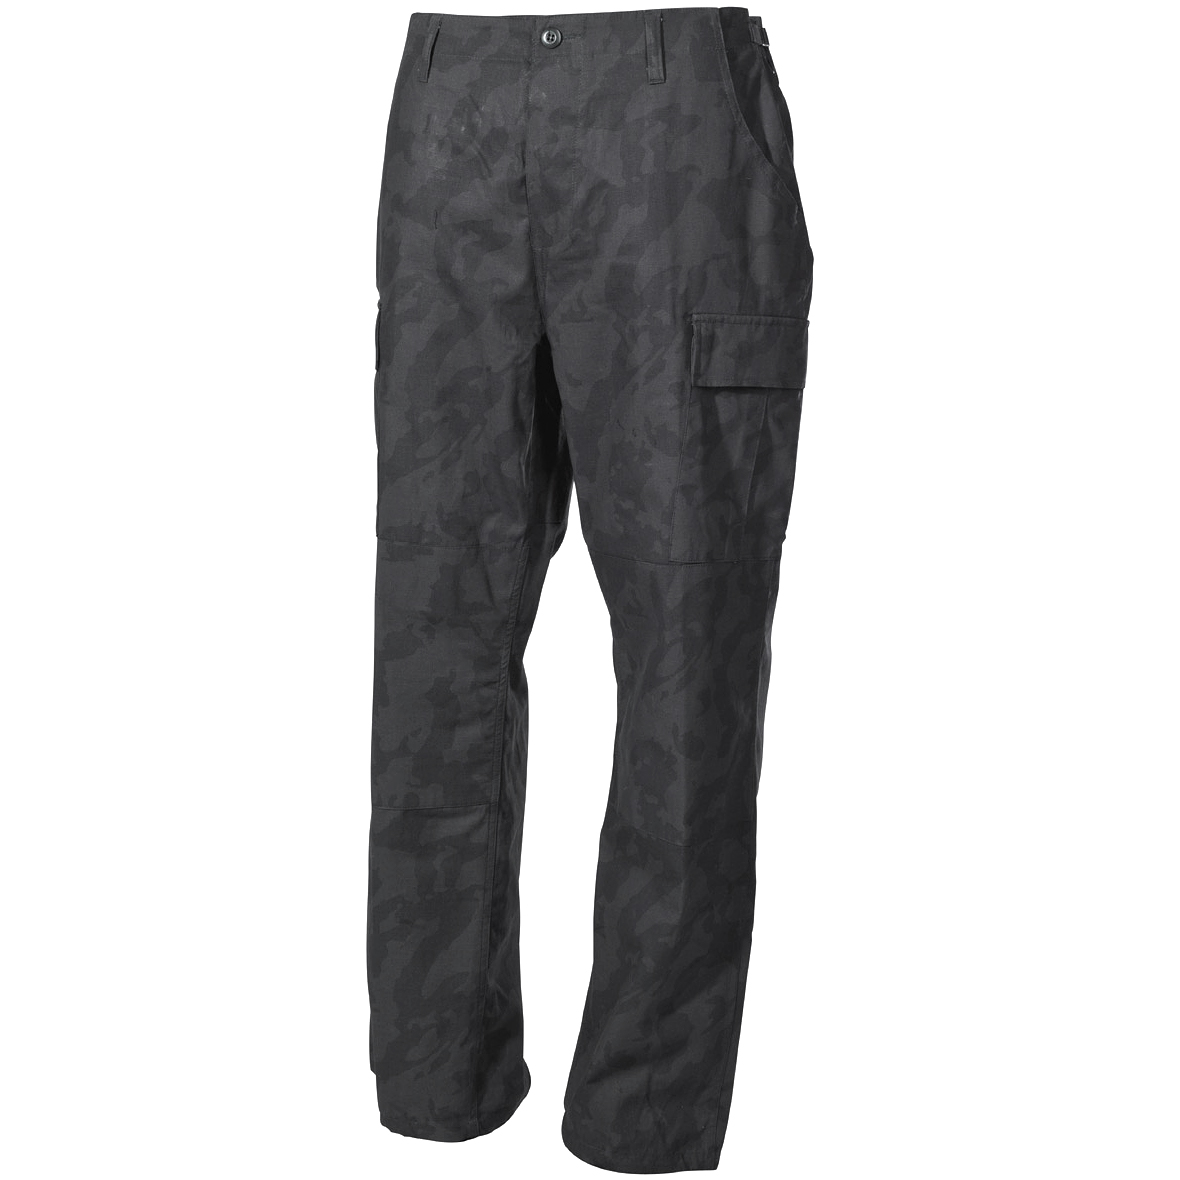 MFH BDU Combat Trousers Ripstop Night Camo MFH BDU Combat Trousers Ripstop  Night Camo